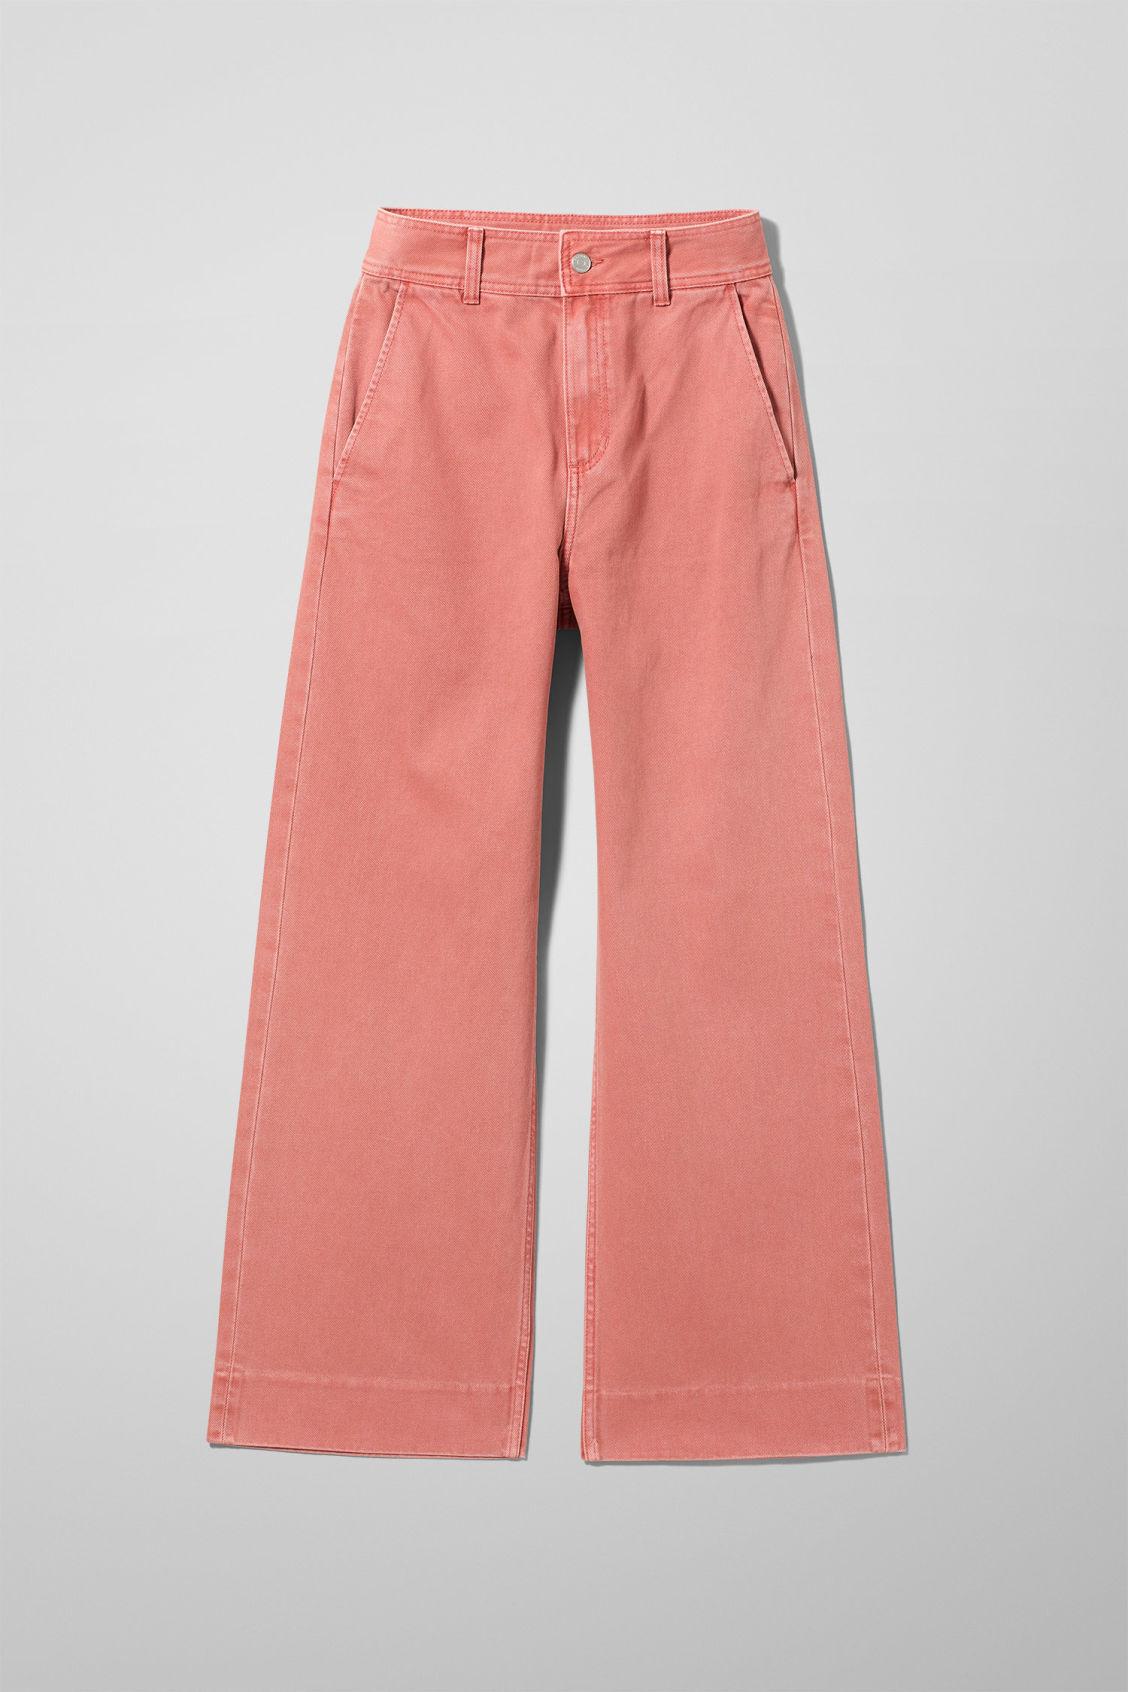 Cory Rose Denim Trousers - Orange-34